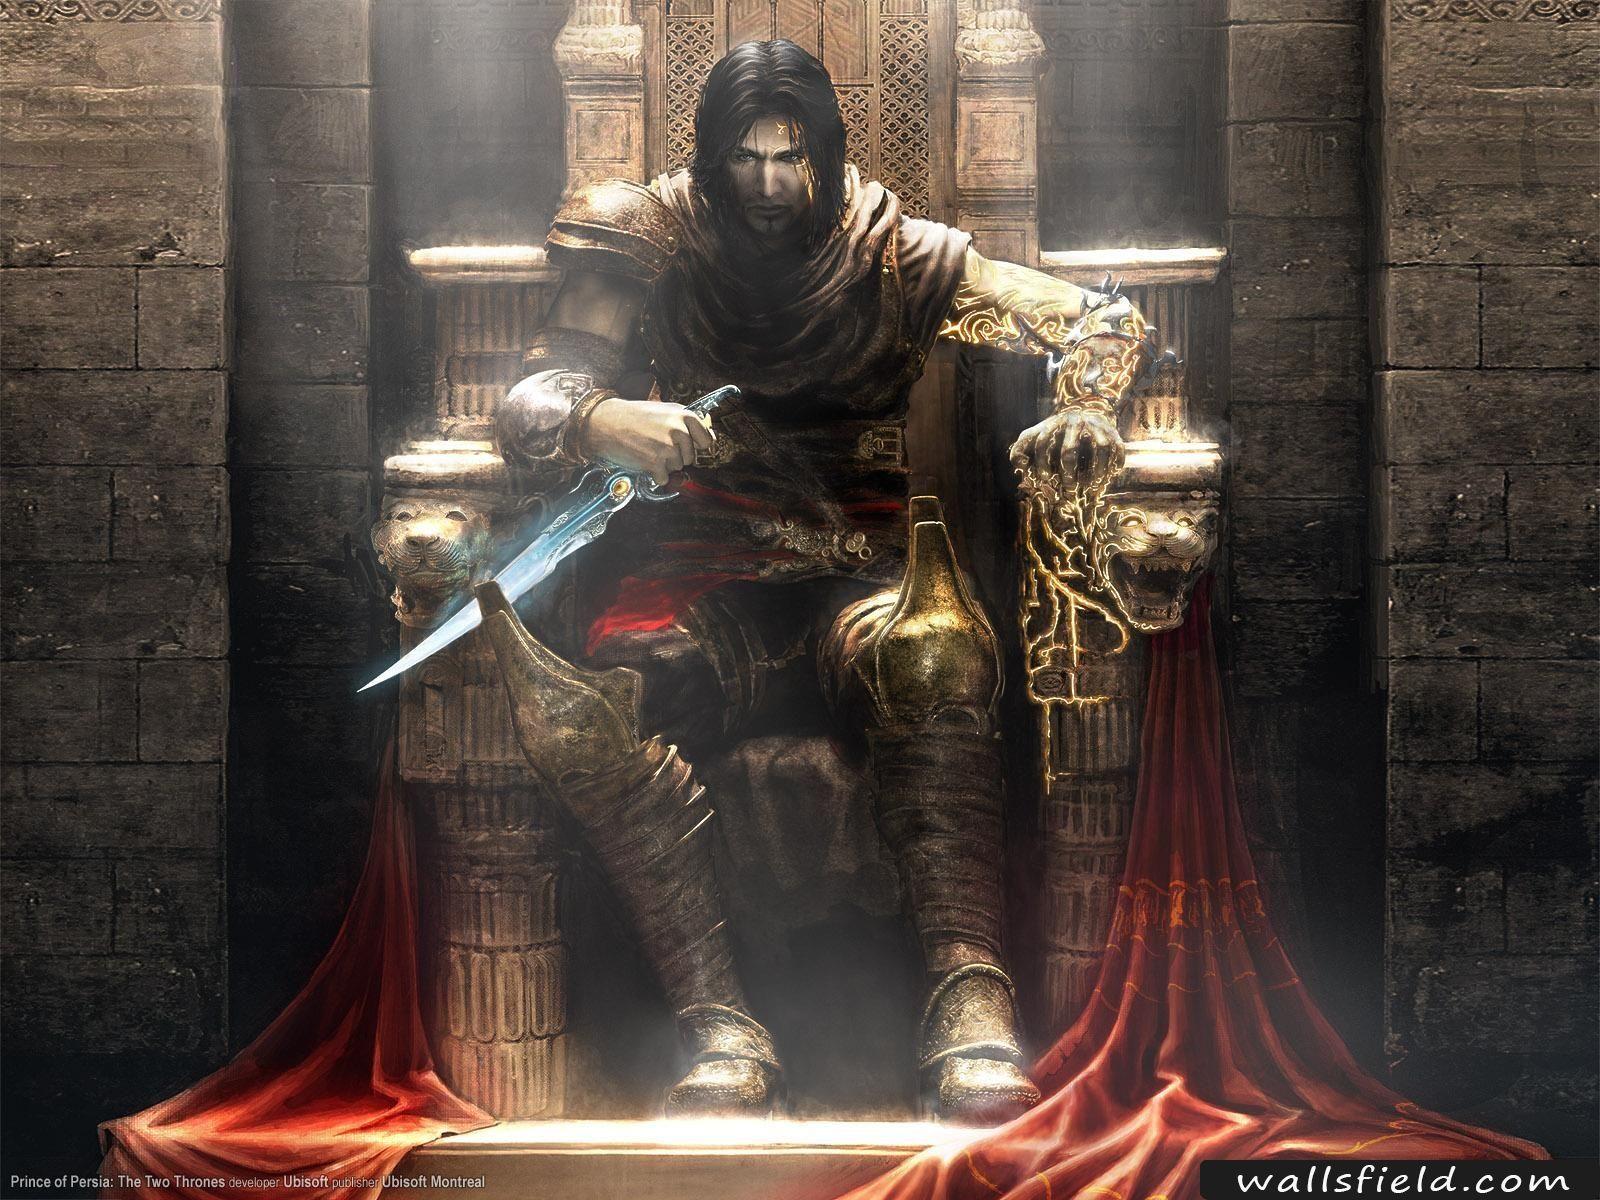 Prince Of Persia Wallsfield Com Free Hd Wallpapers Prince Of Persia Persia Ancient Mythology